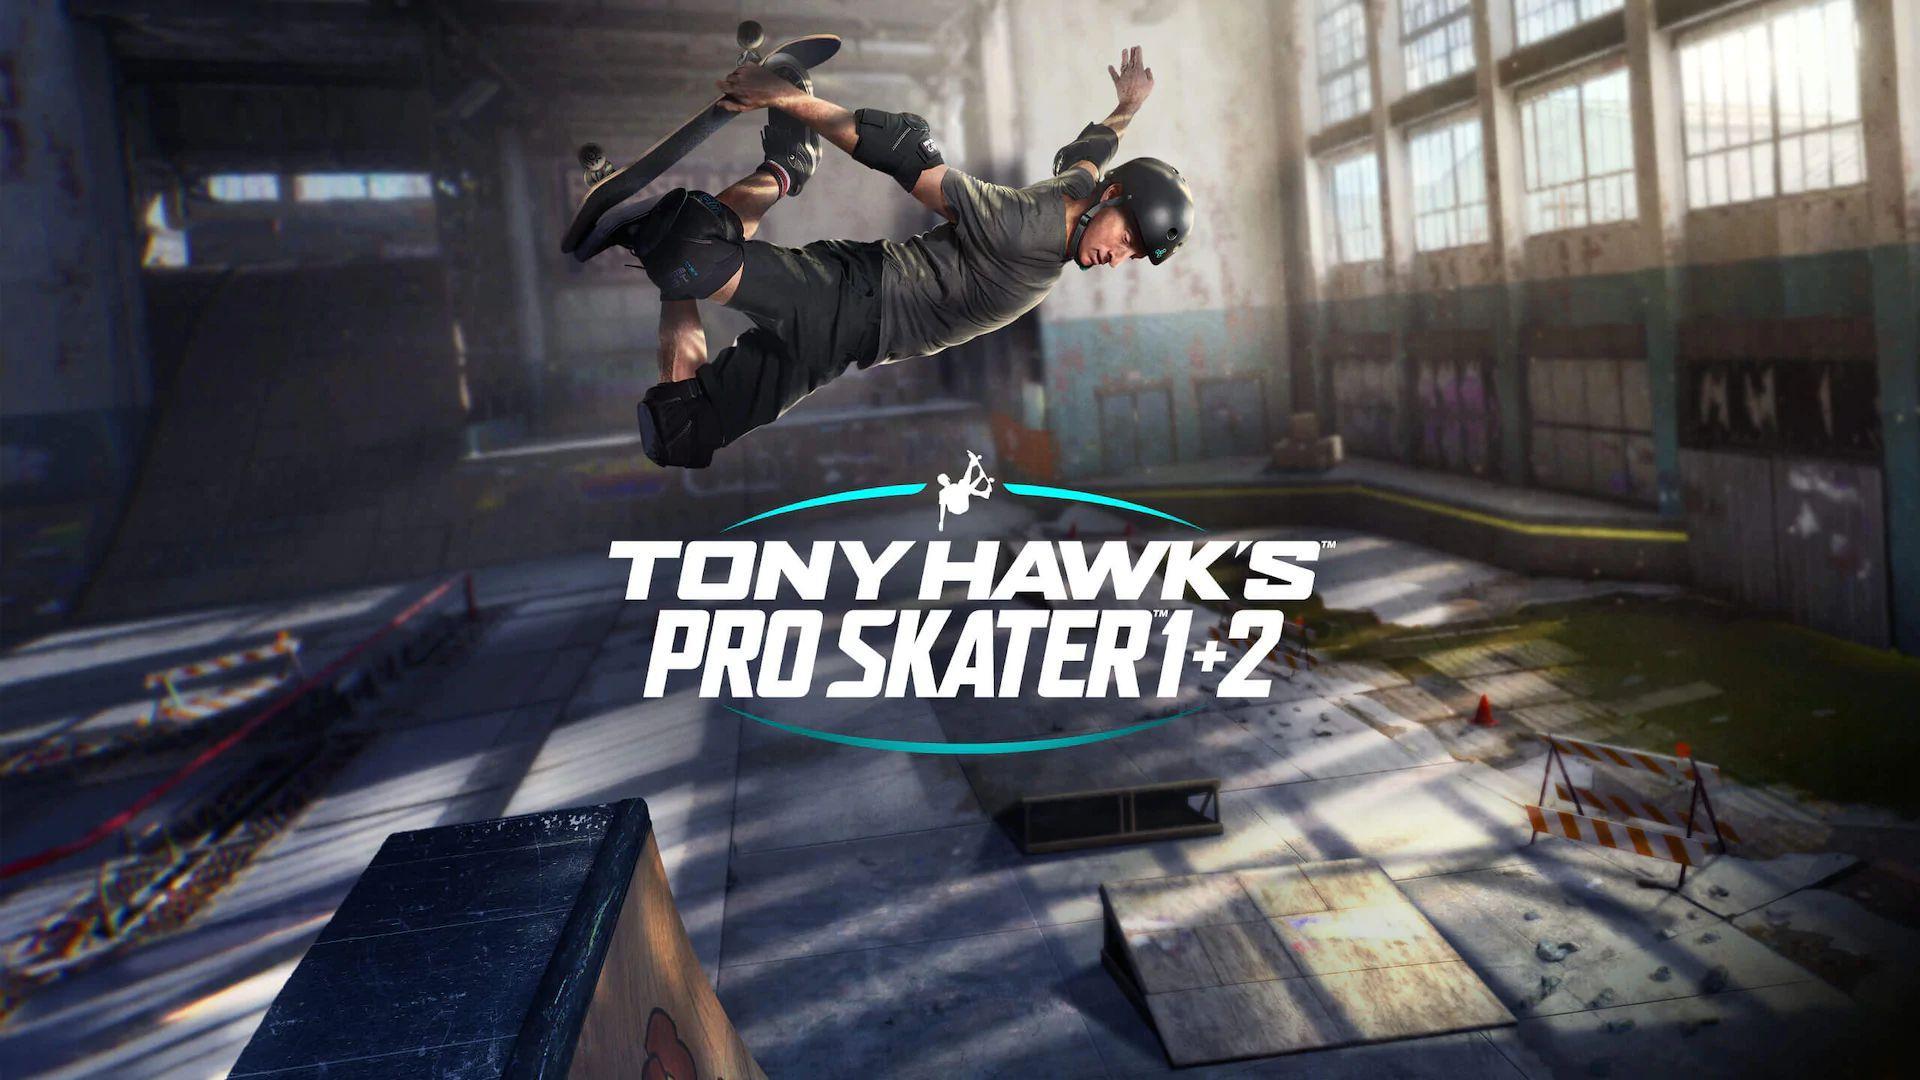 Tony Hawk's Pro Skater 1 + 2 Avis